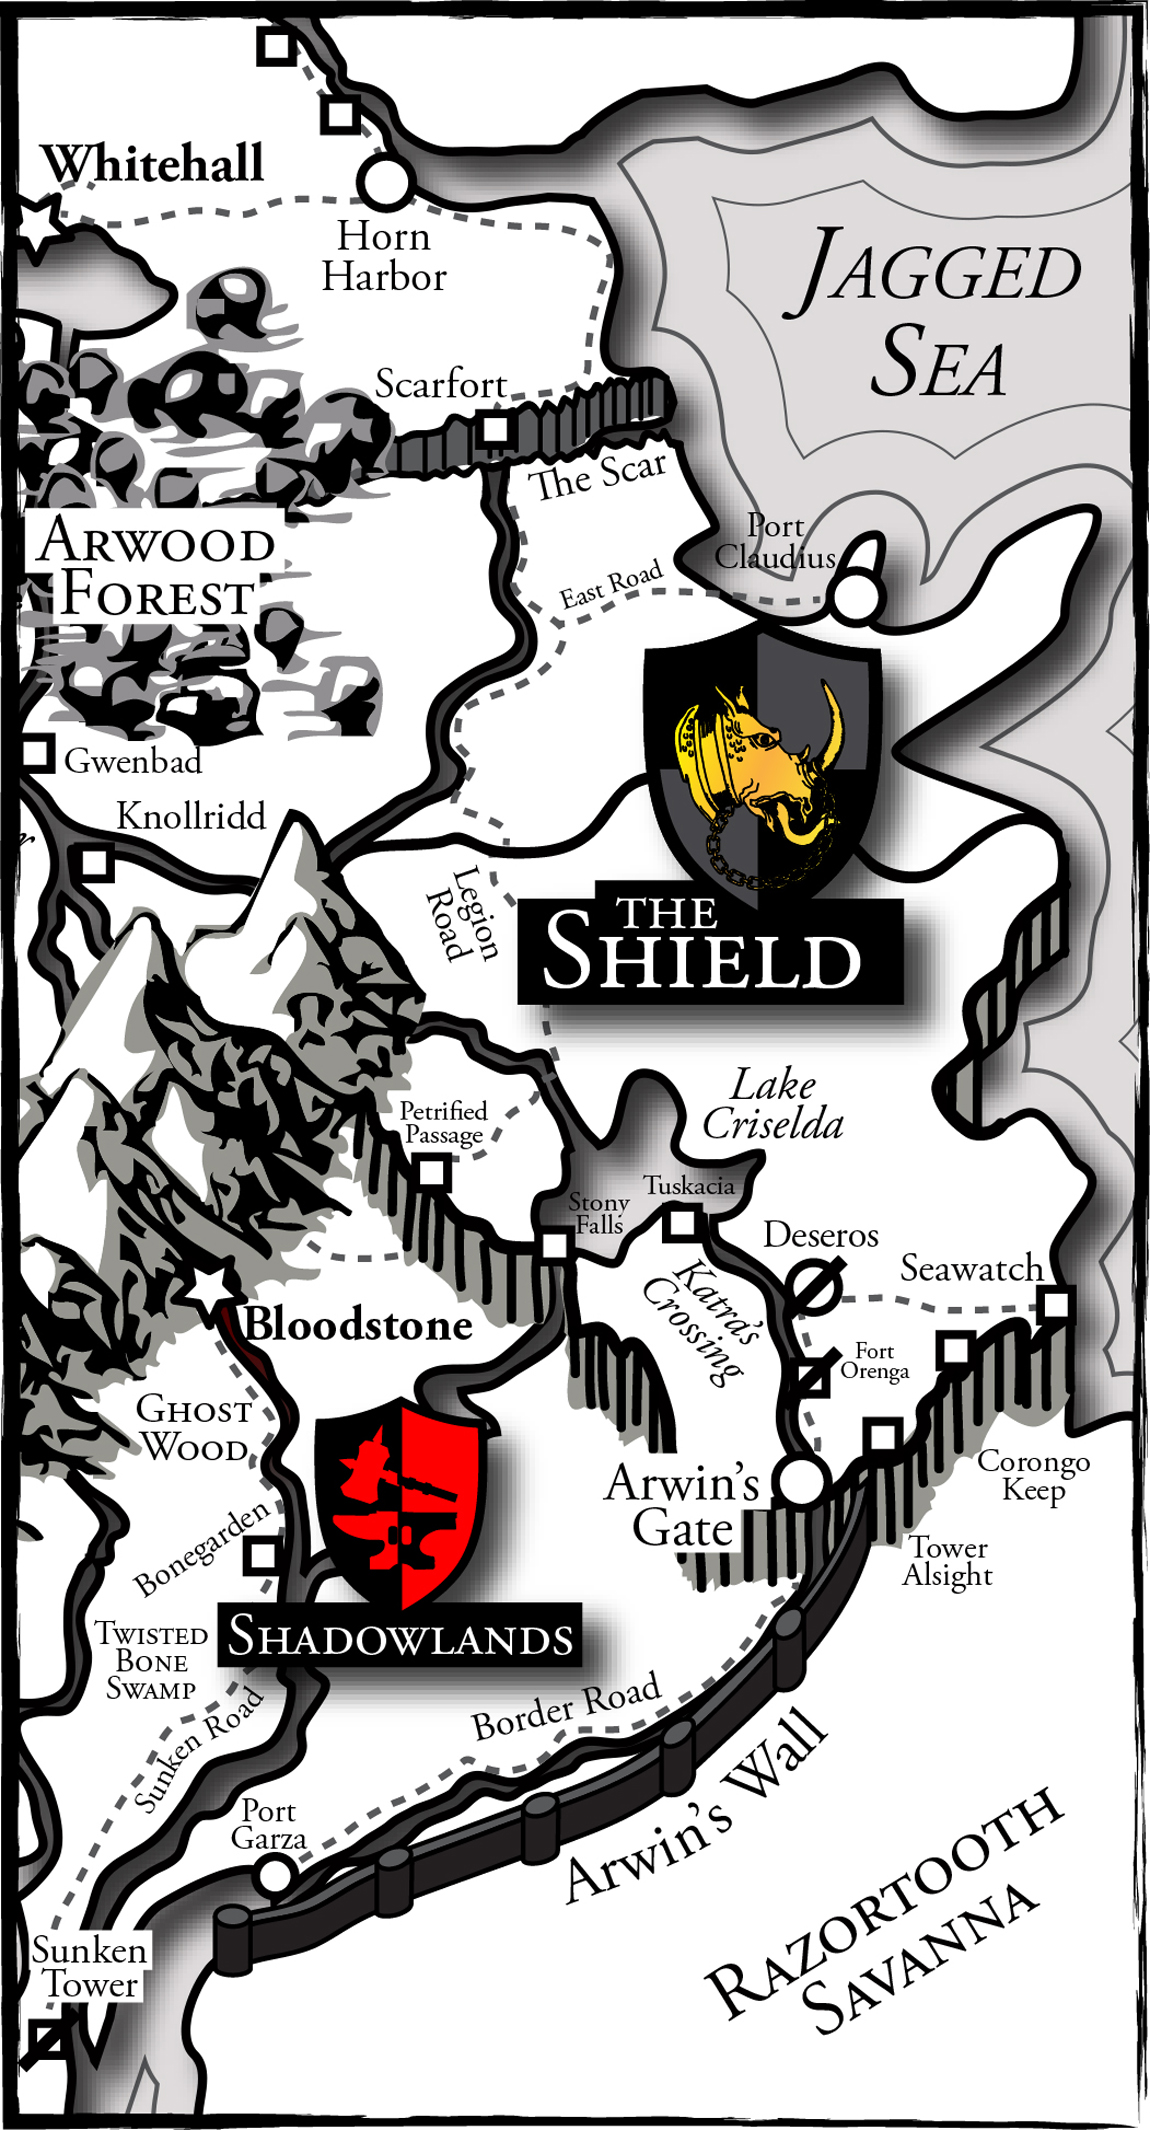 TheShieldMap.jpg